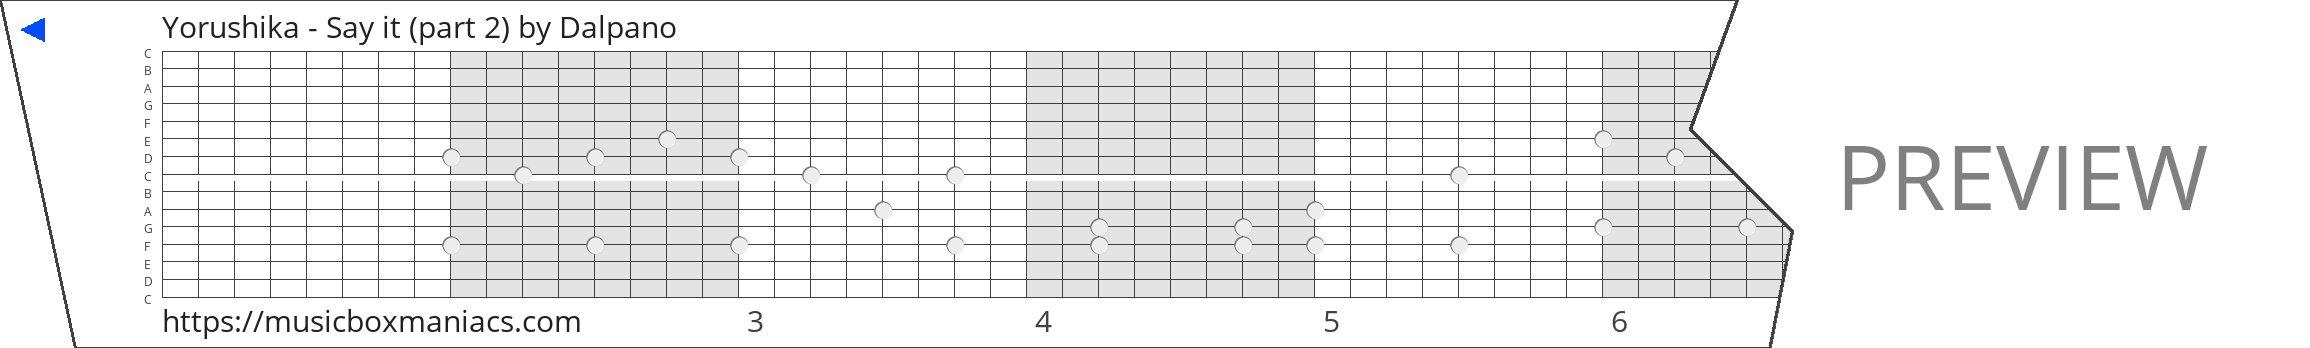 Yorushika - Say it (part 2) 15 note music box paper strip